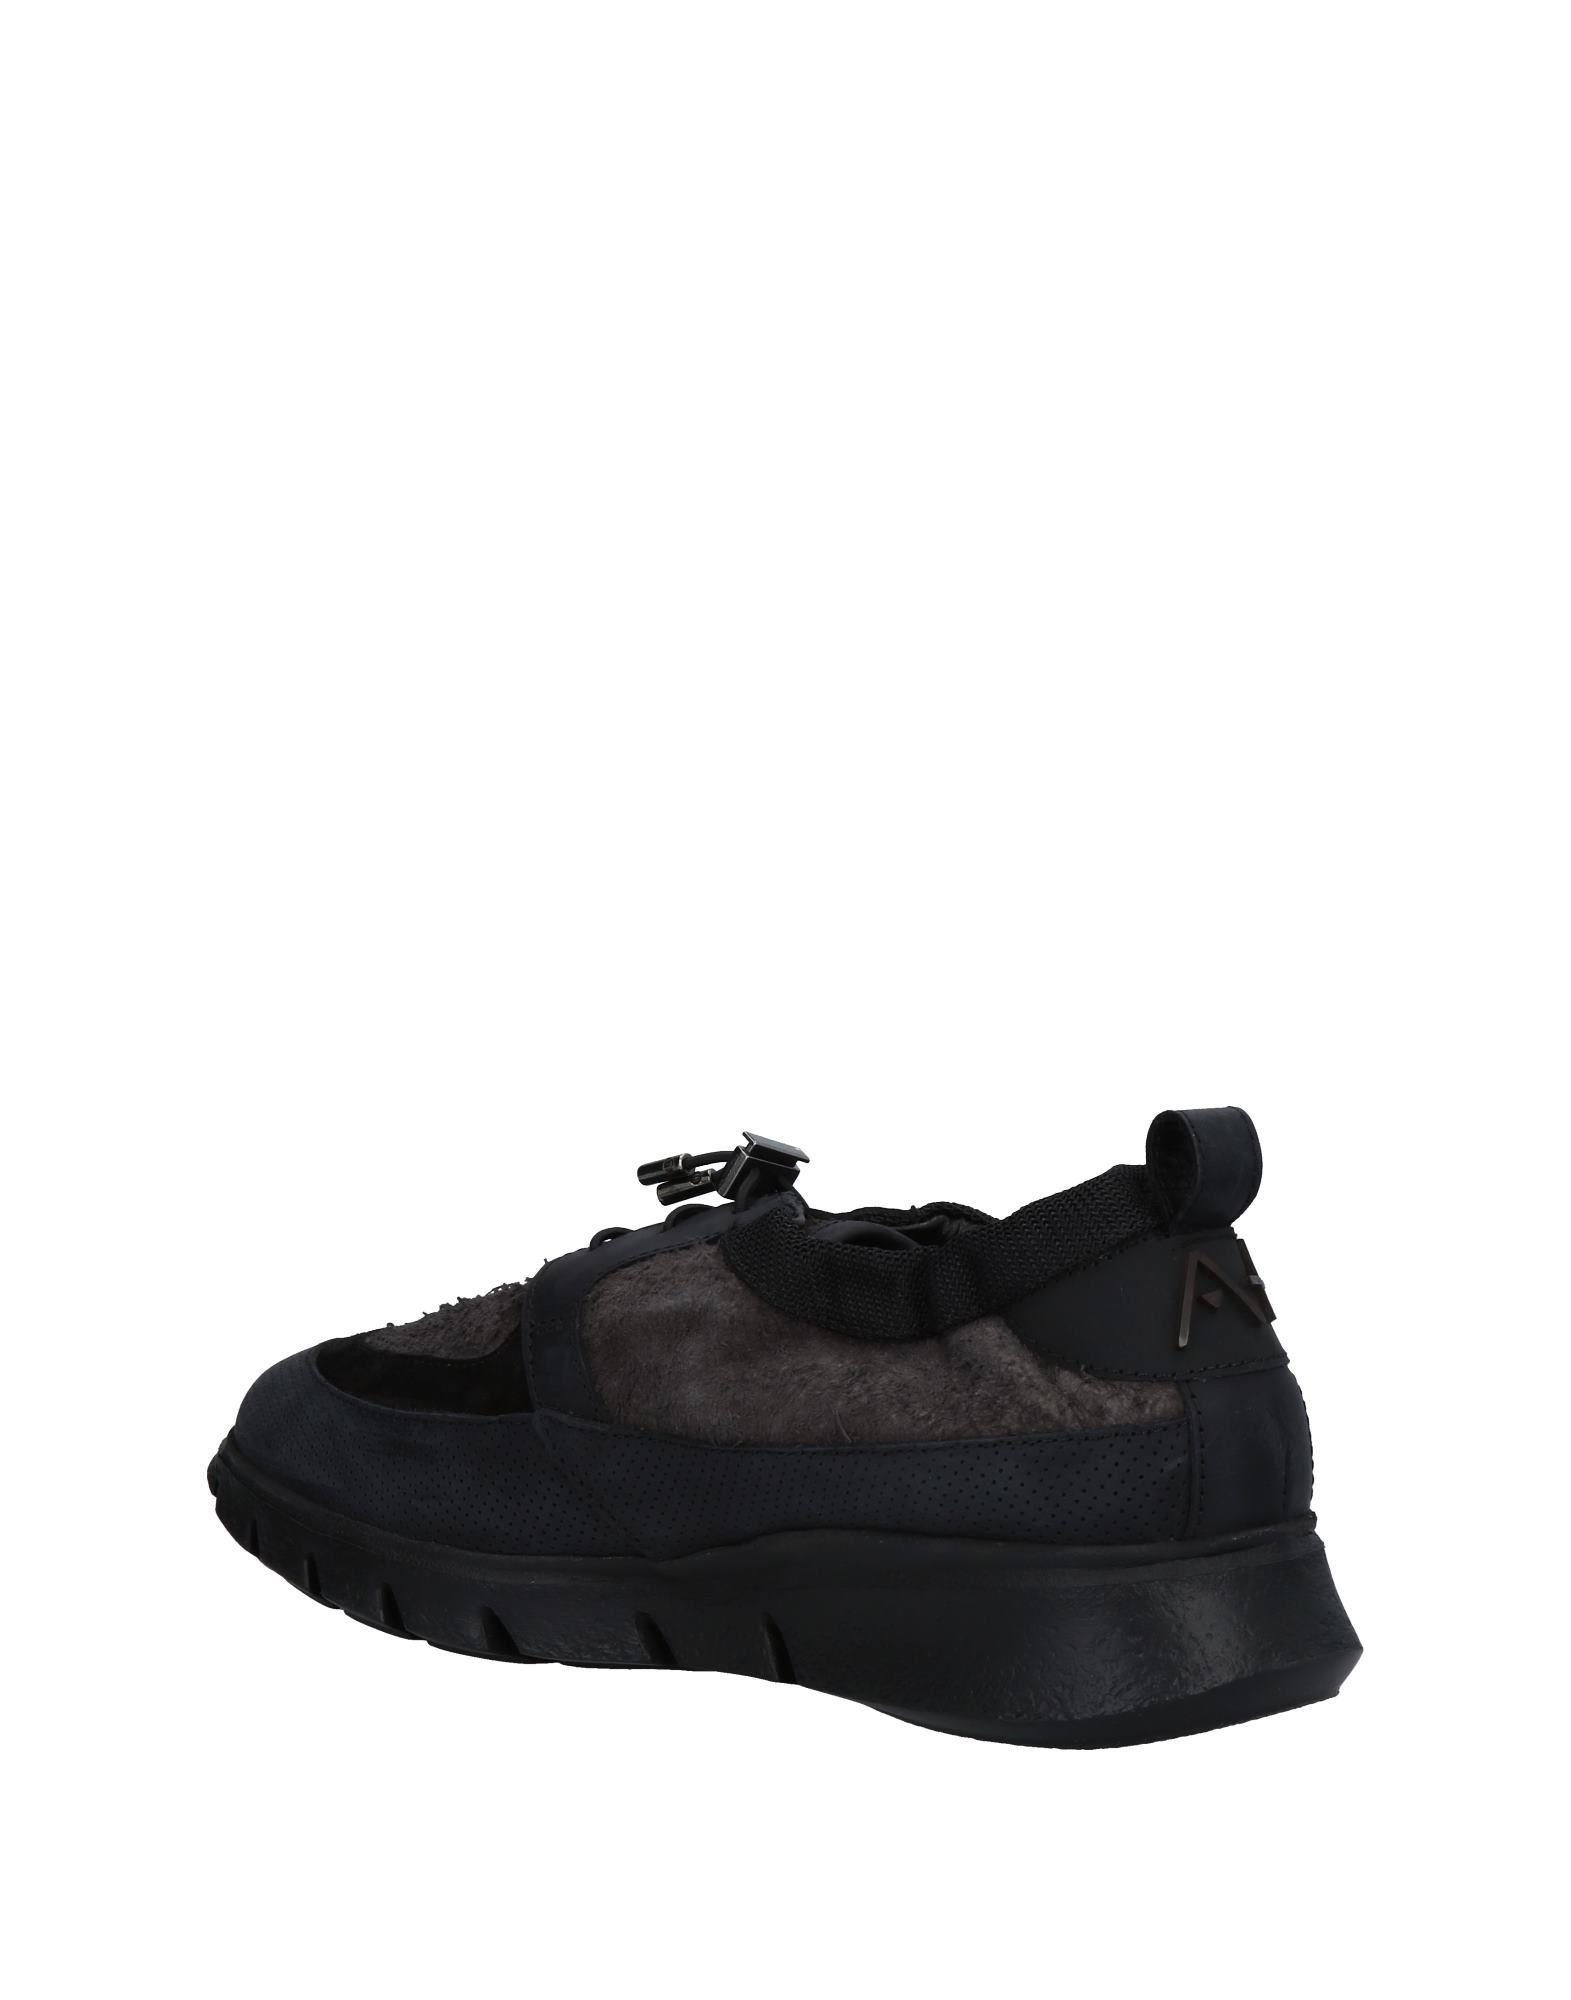 Rabatt echte Schuhe Schuhe Schuhe A+ Sneakers Herren  11481288NJ 4cb49a